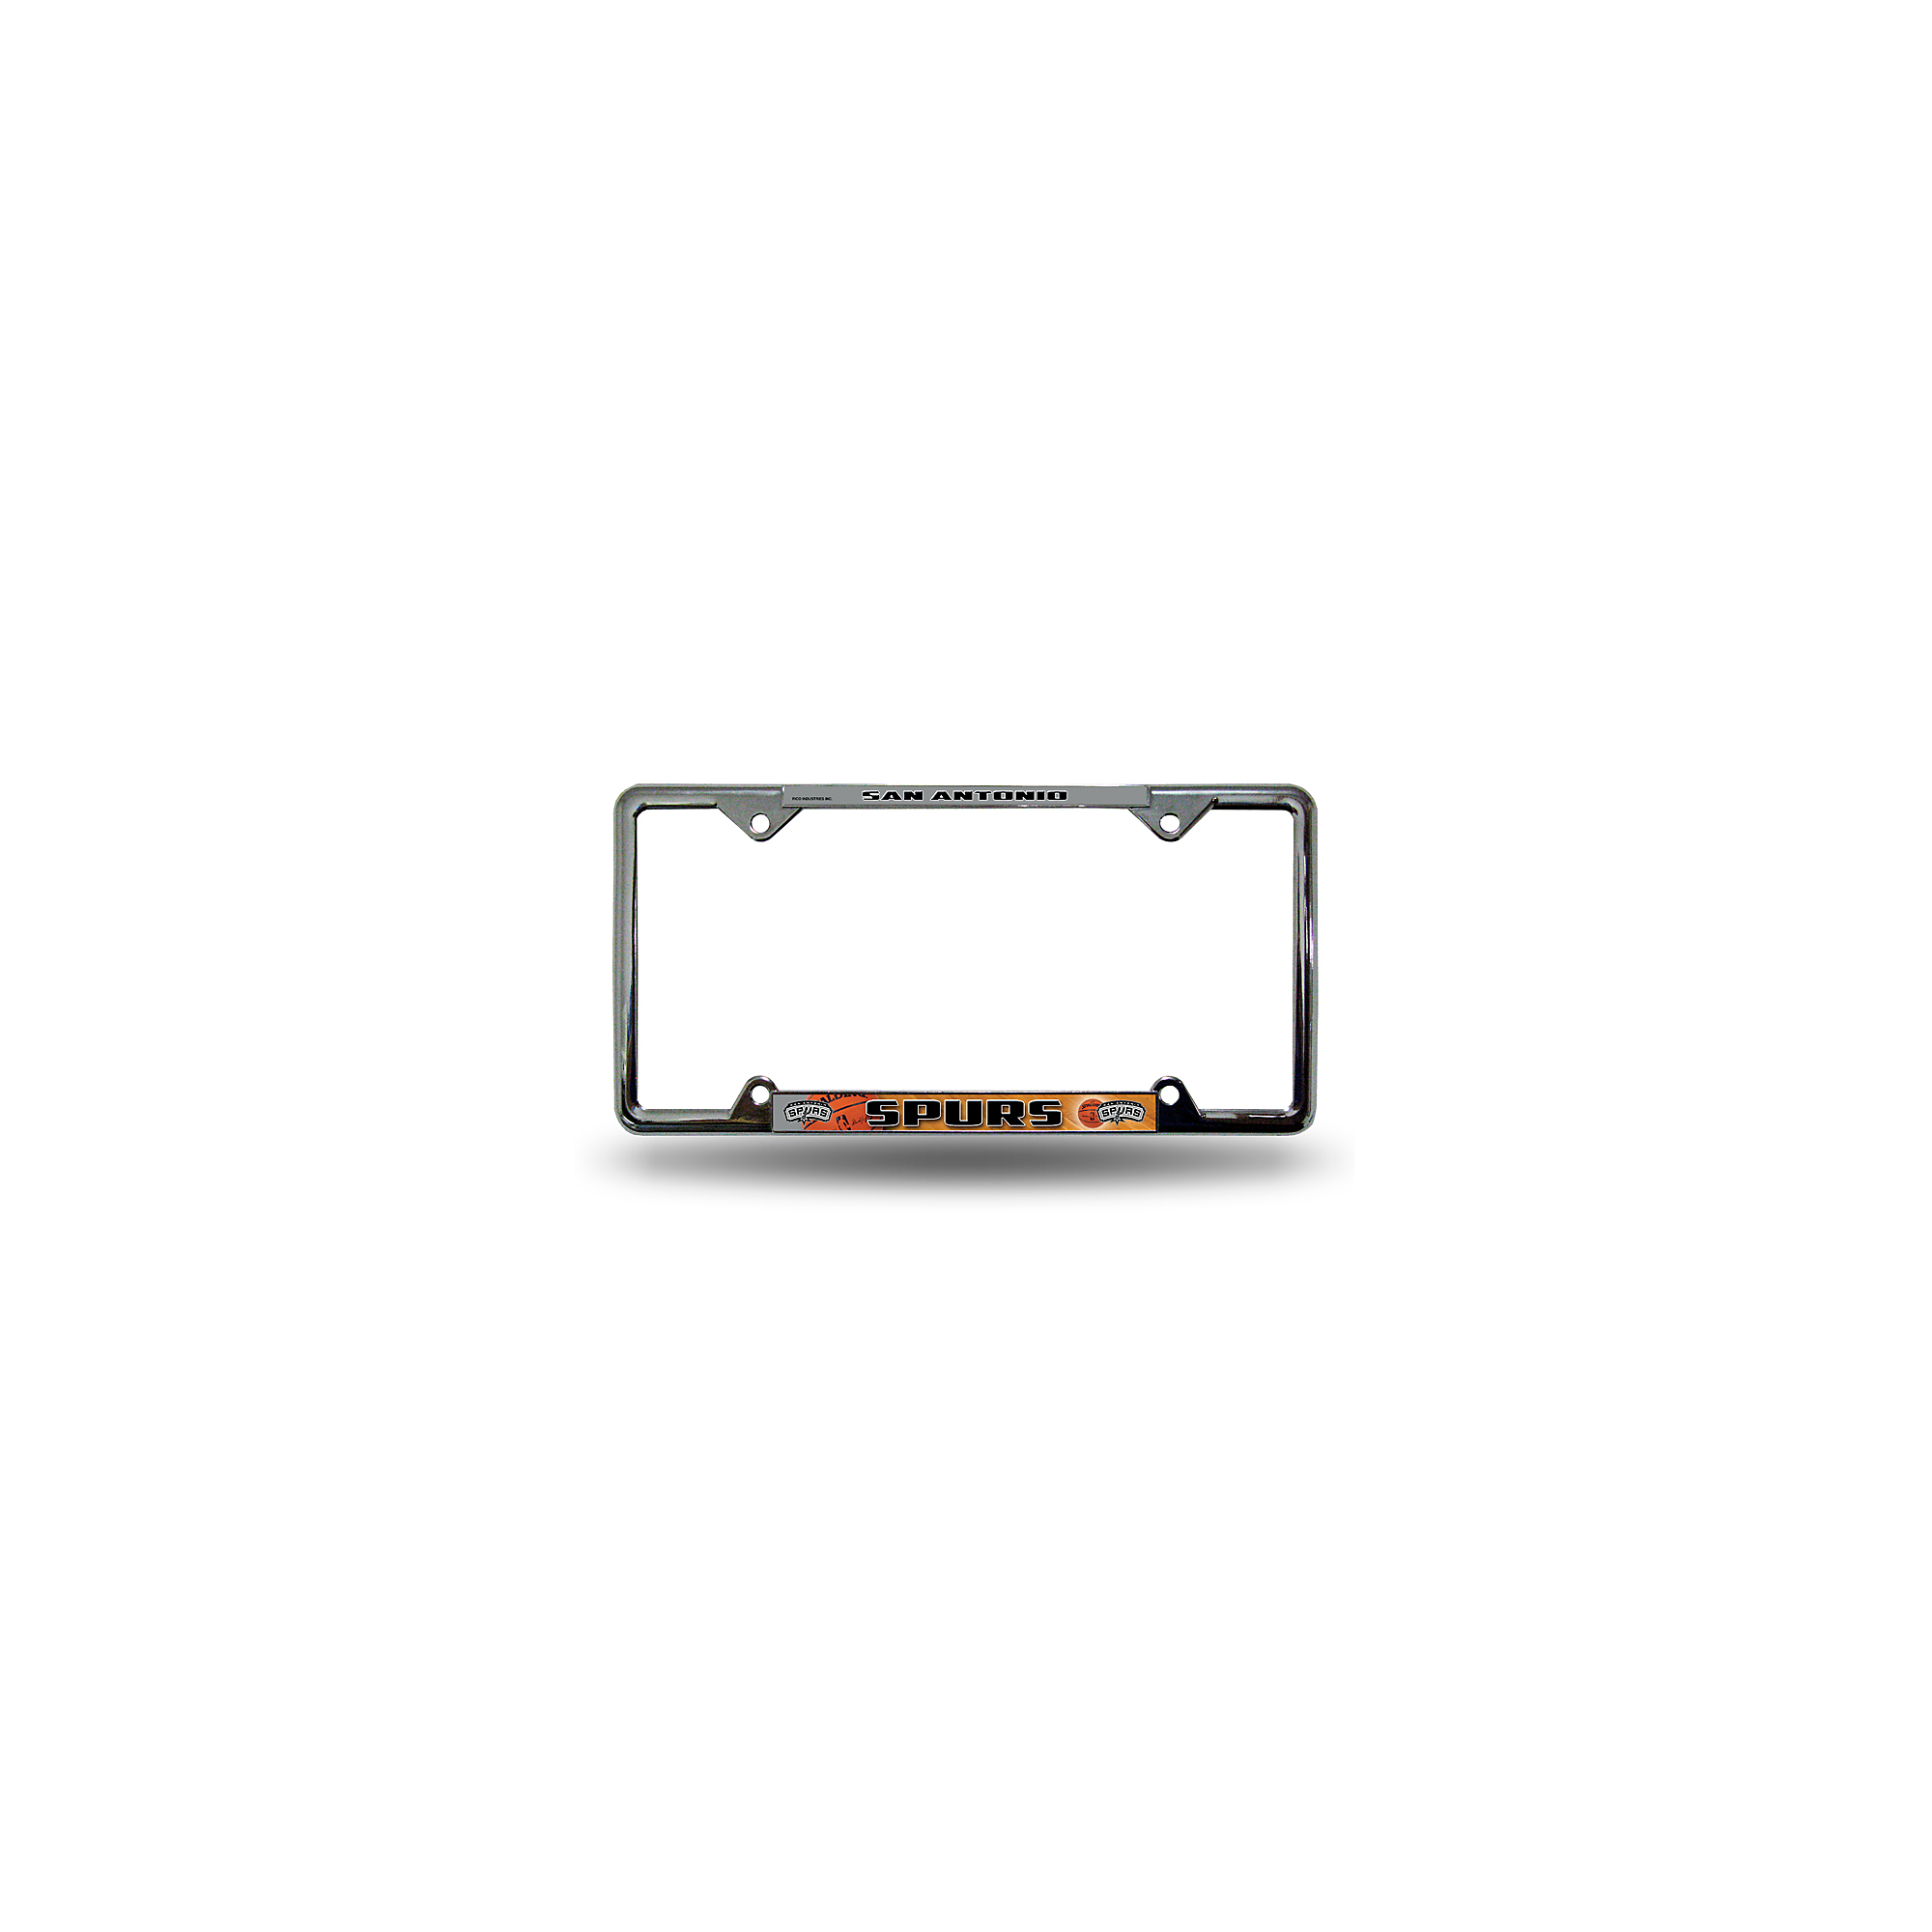 San Antonio Spurs EZ View Chrome License Plate Frame